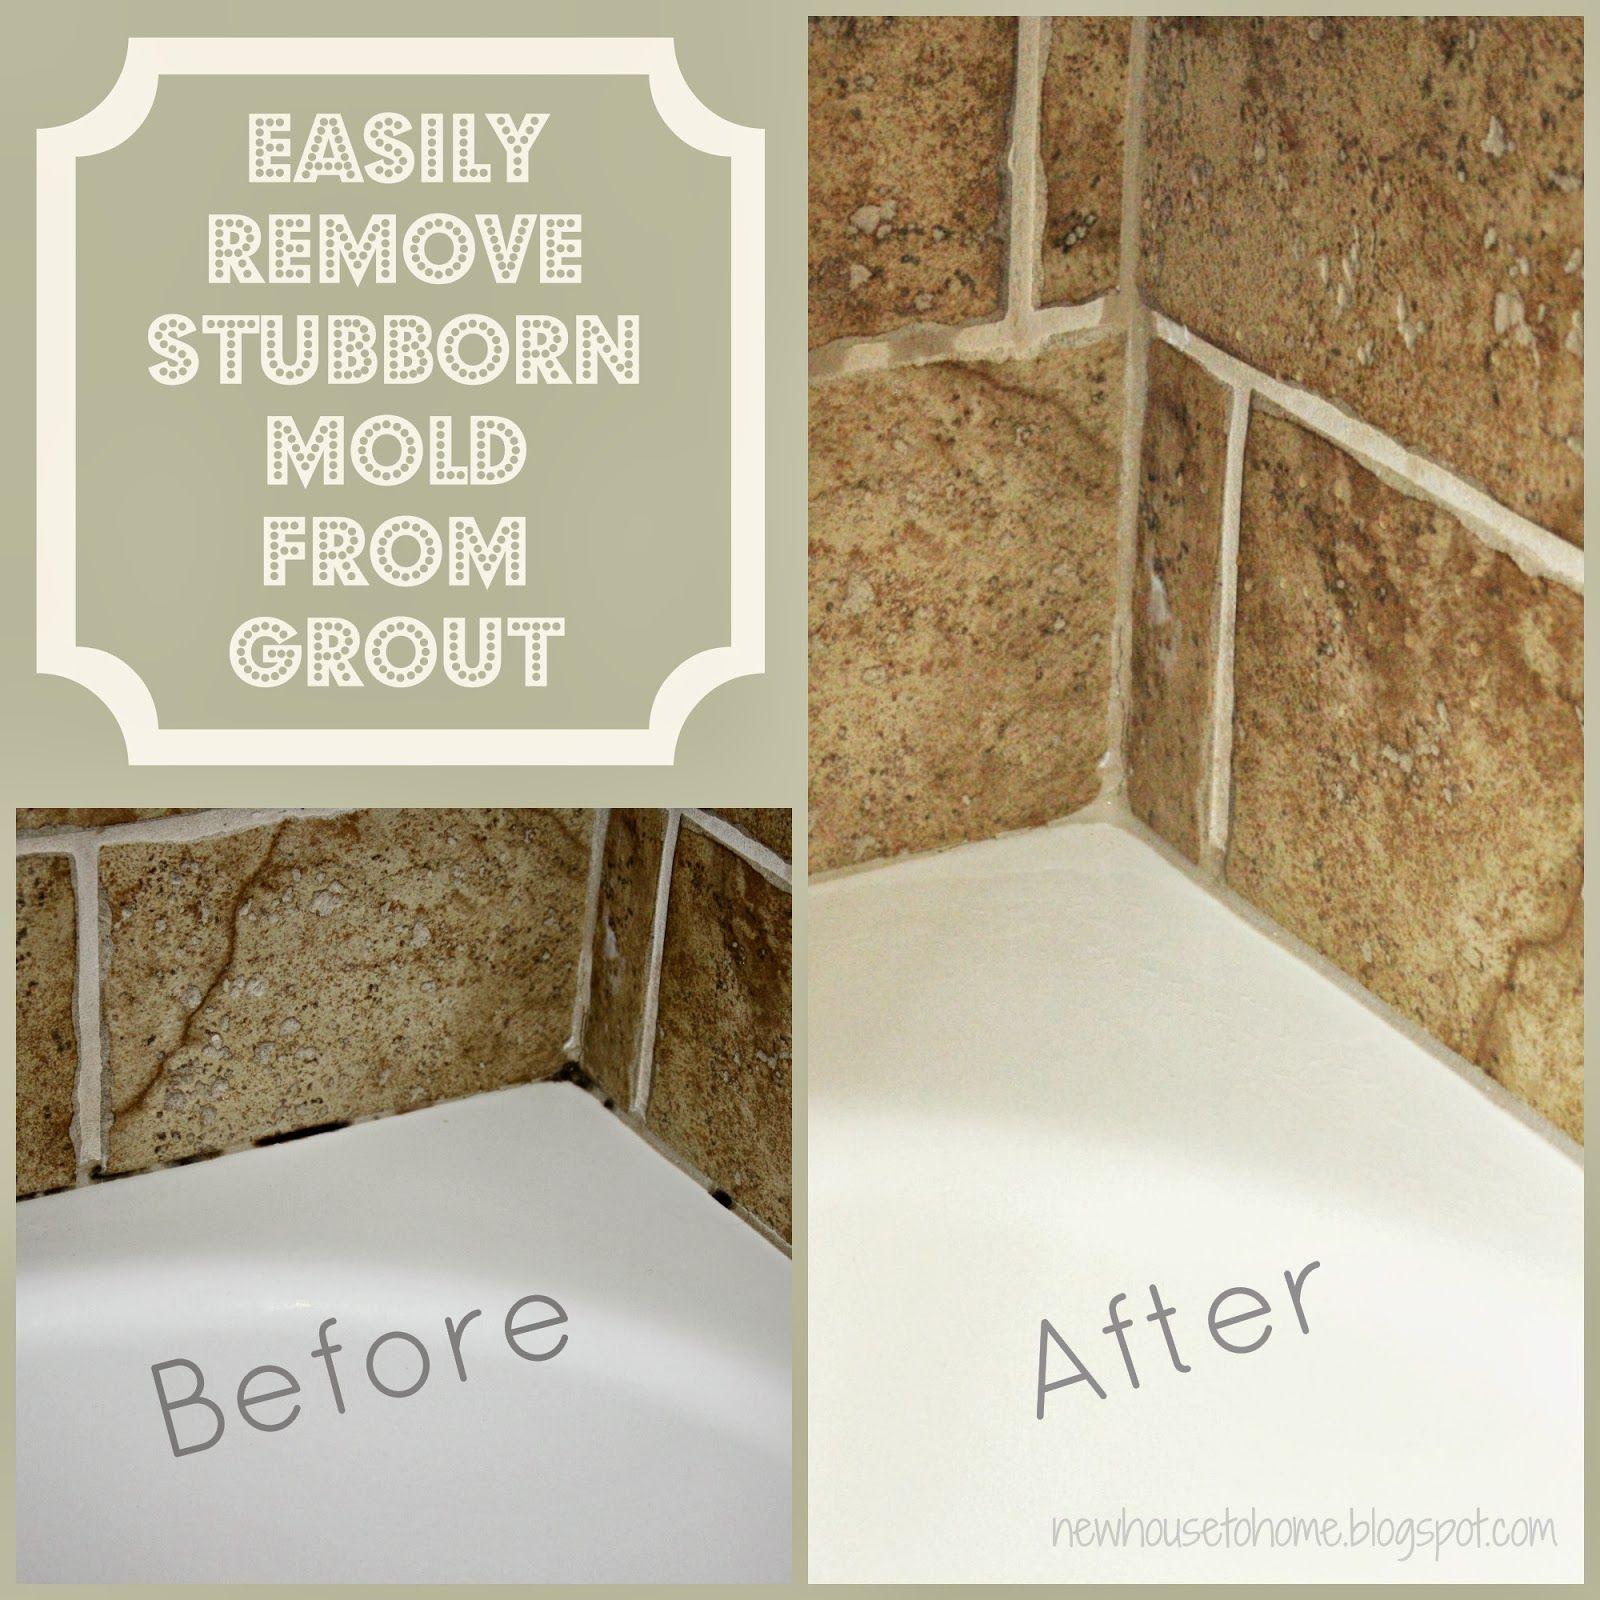 ec387fc157a61d88eba4edd463f2ffde - How To Get Rid Of Red Mold In Bathroom